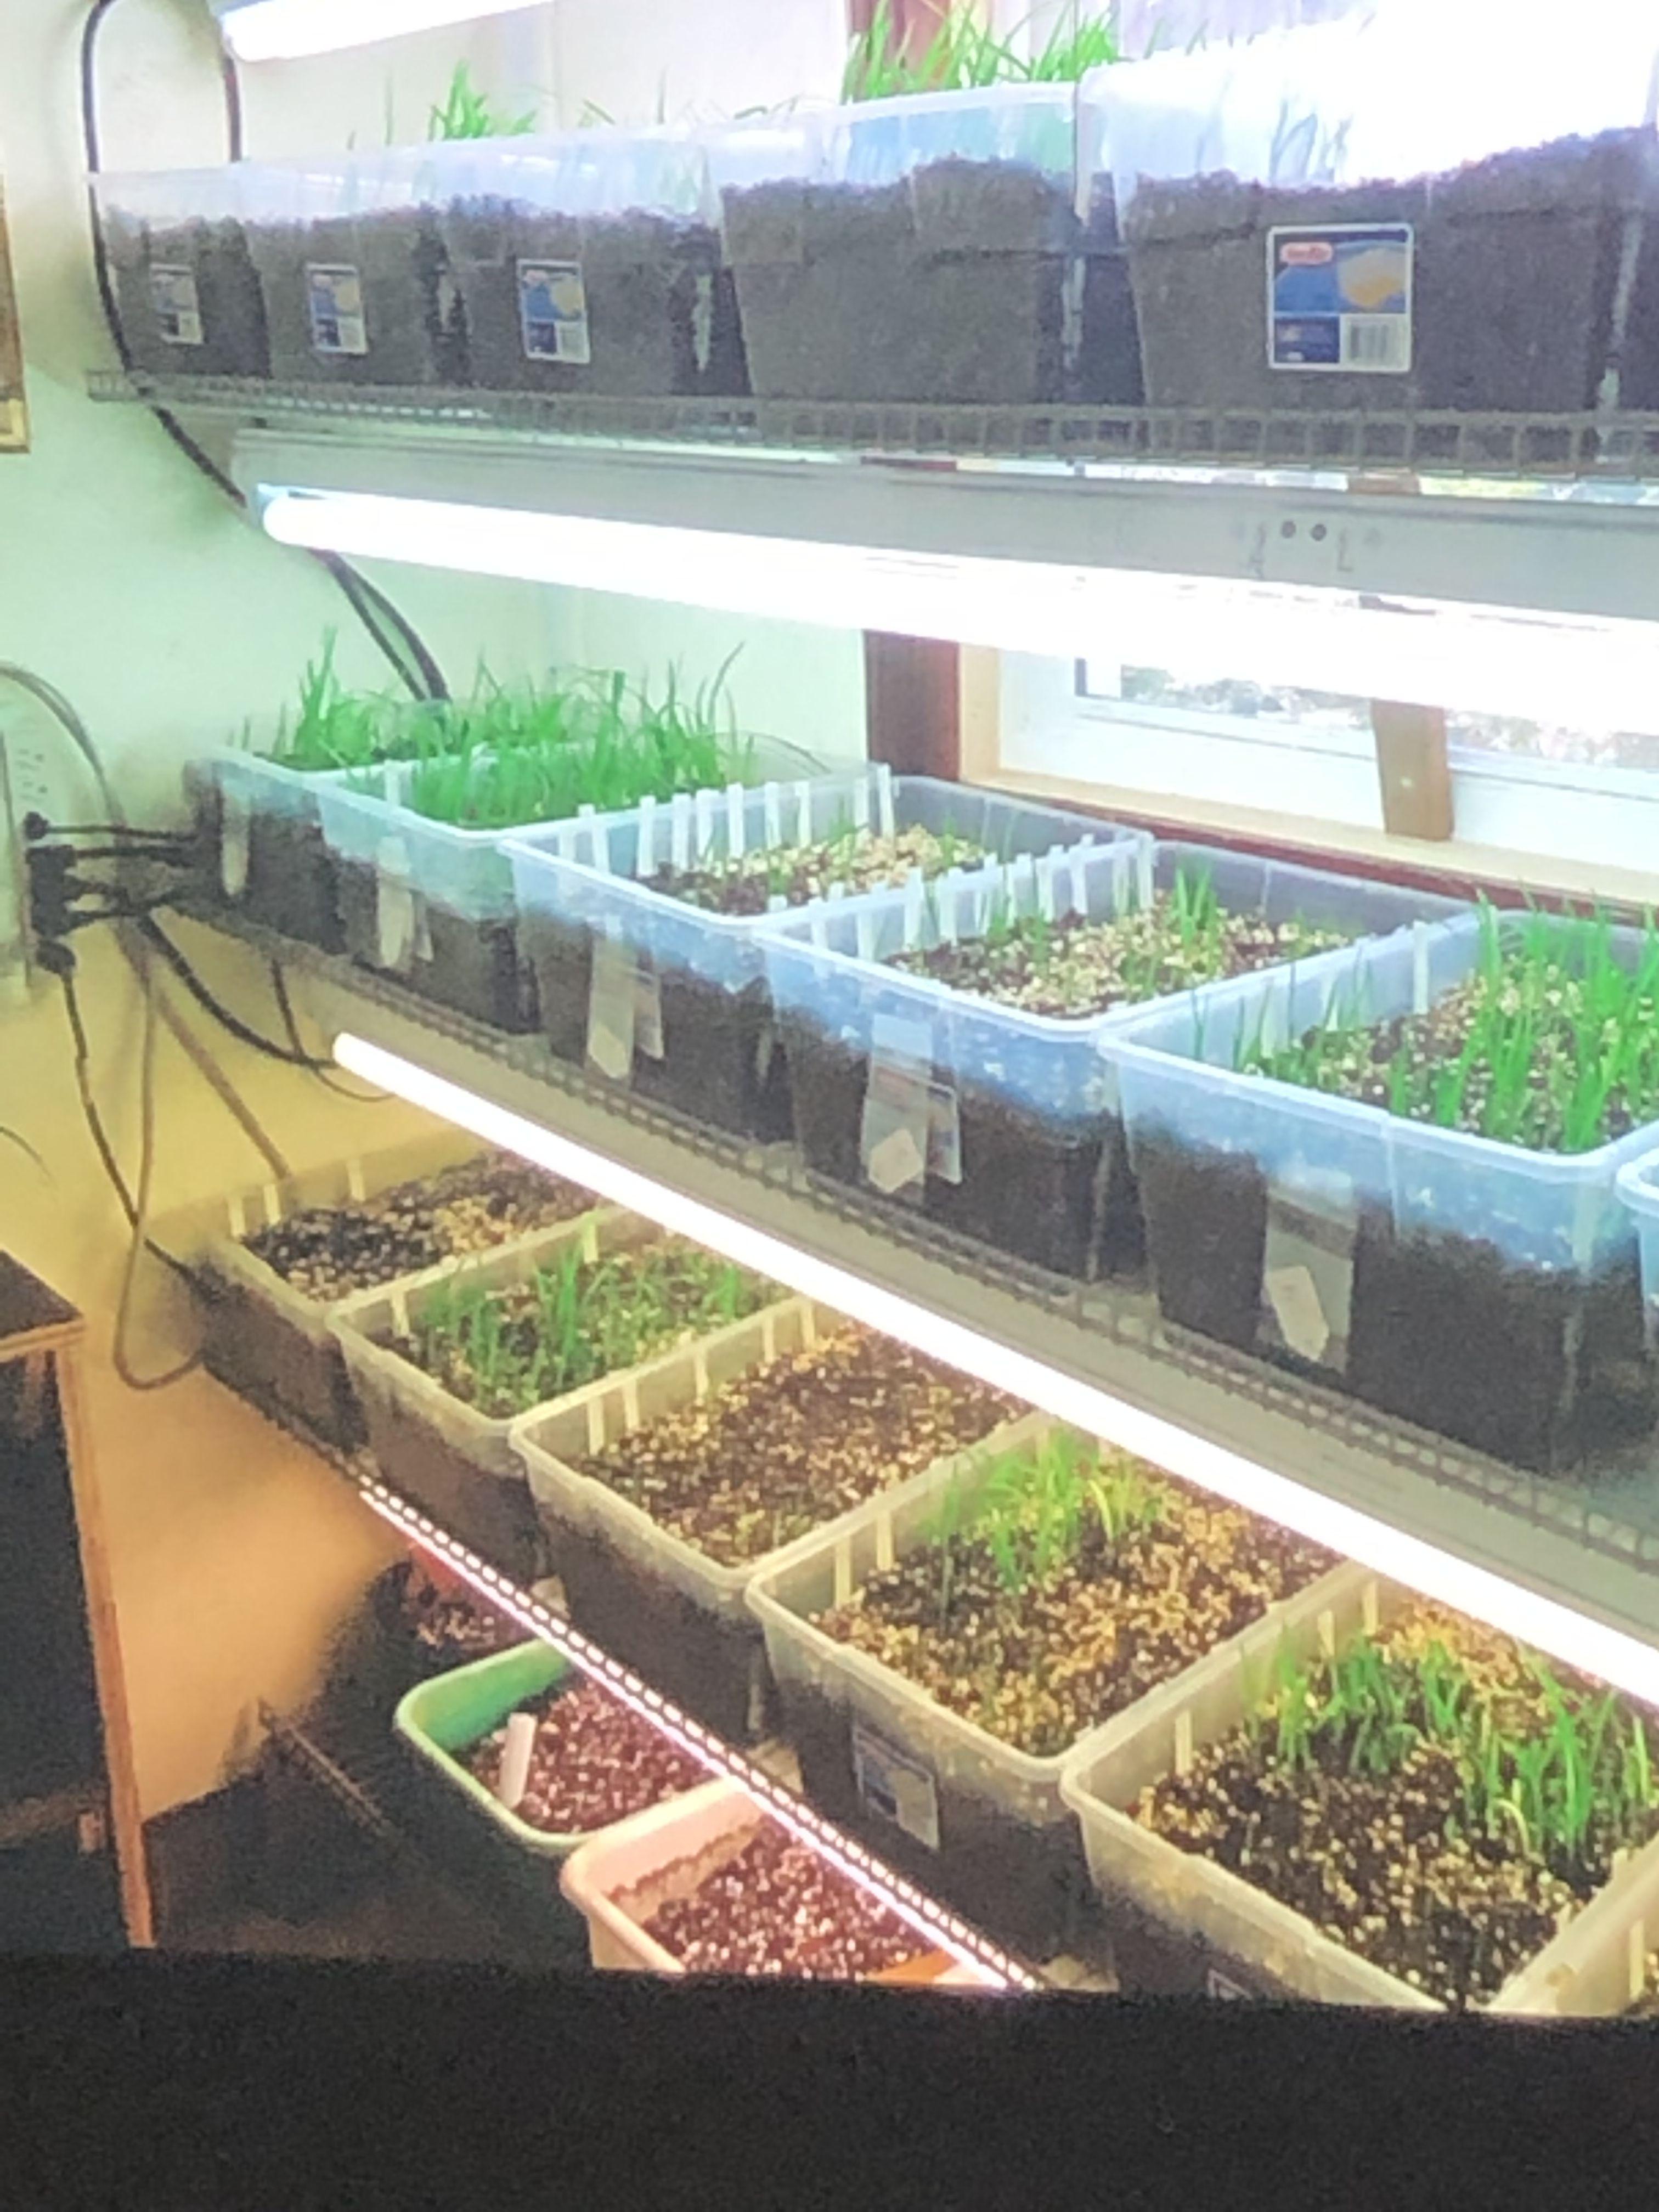 Plant Seeds In Bins Around February Using Regular Fluorescent